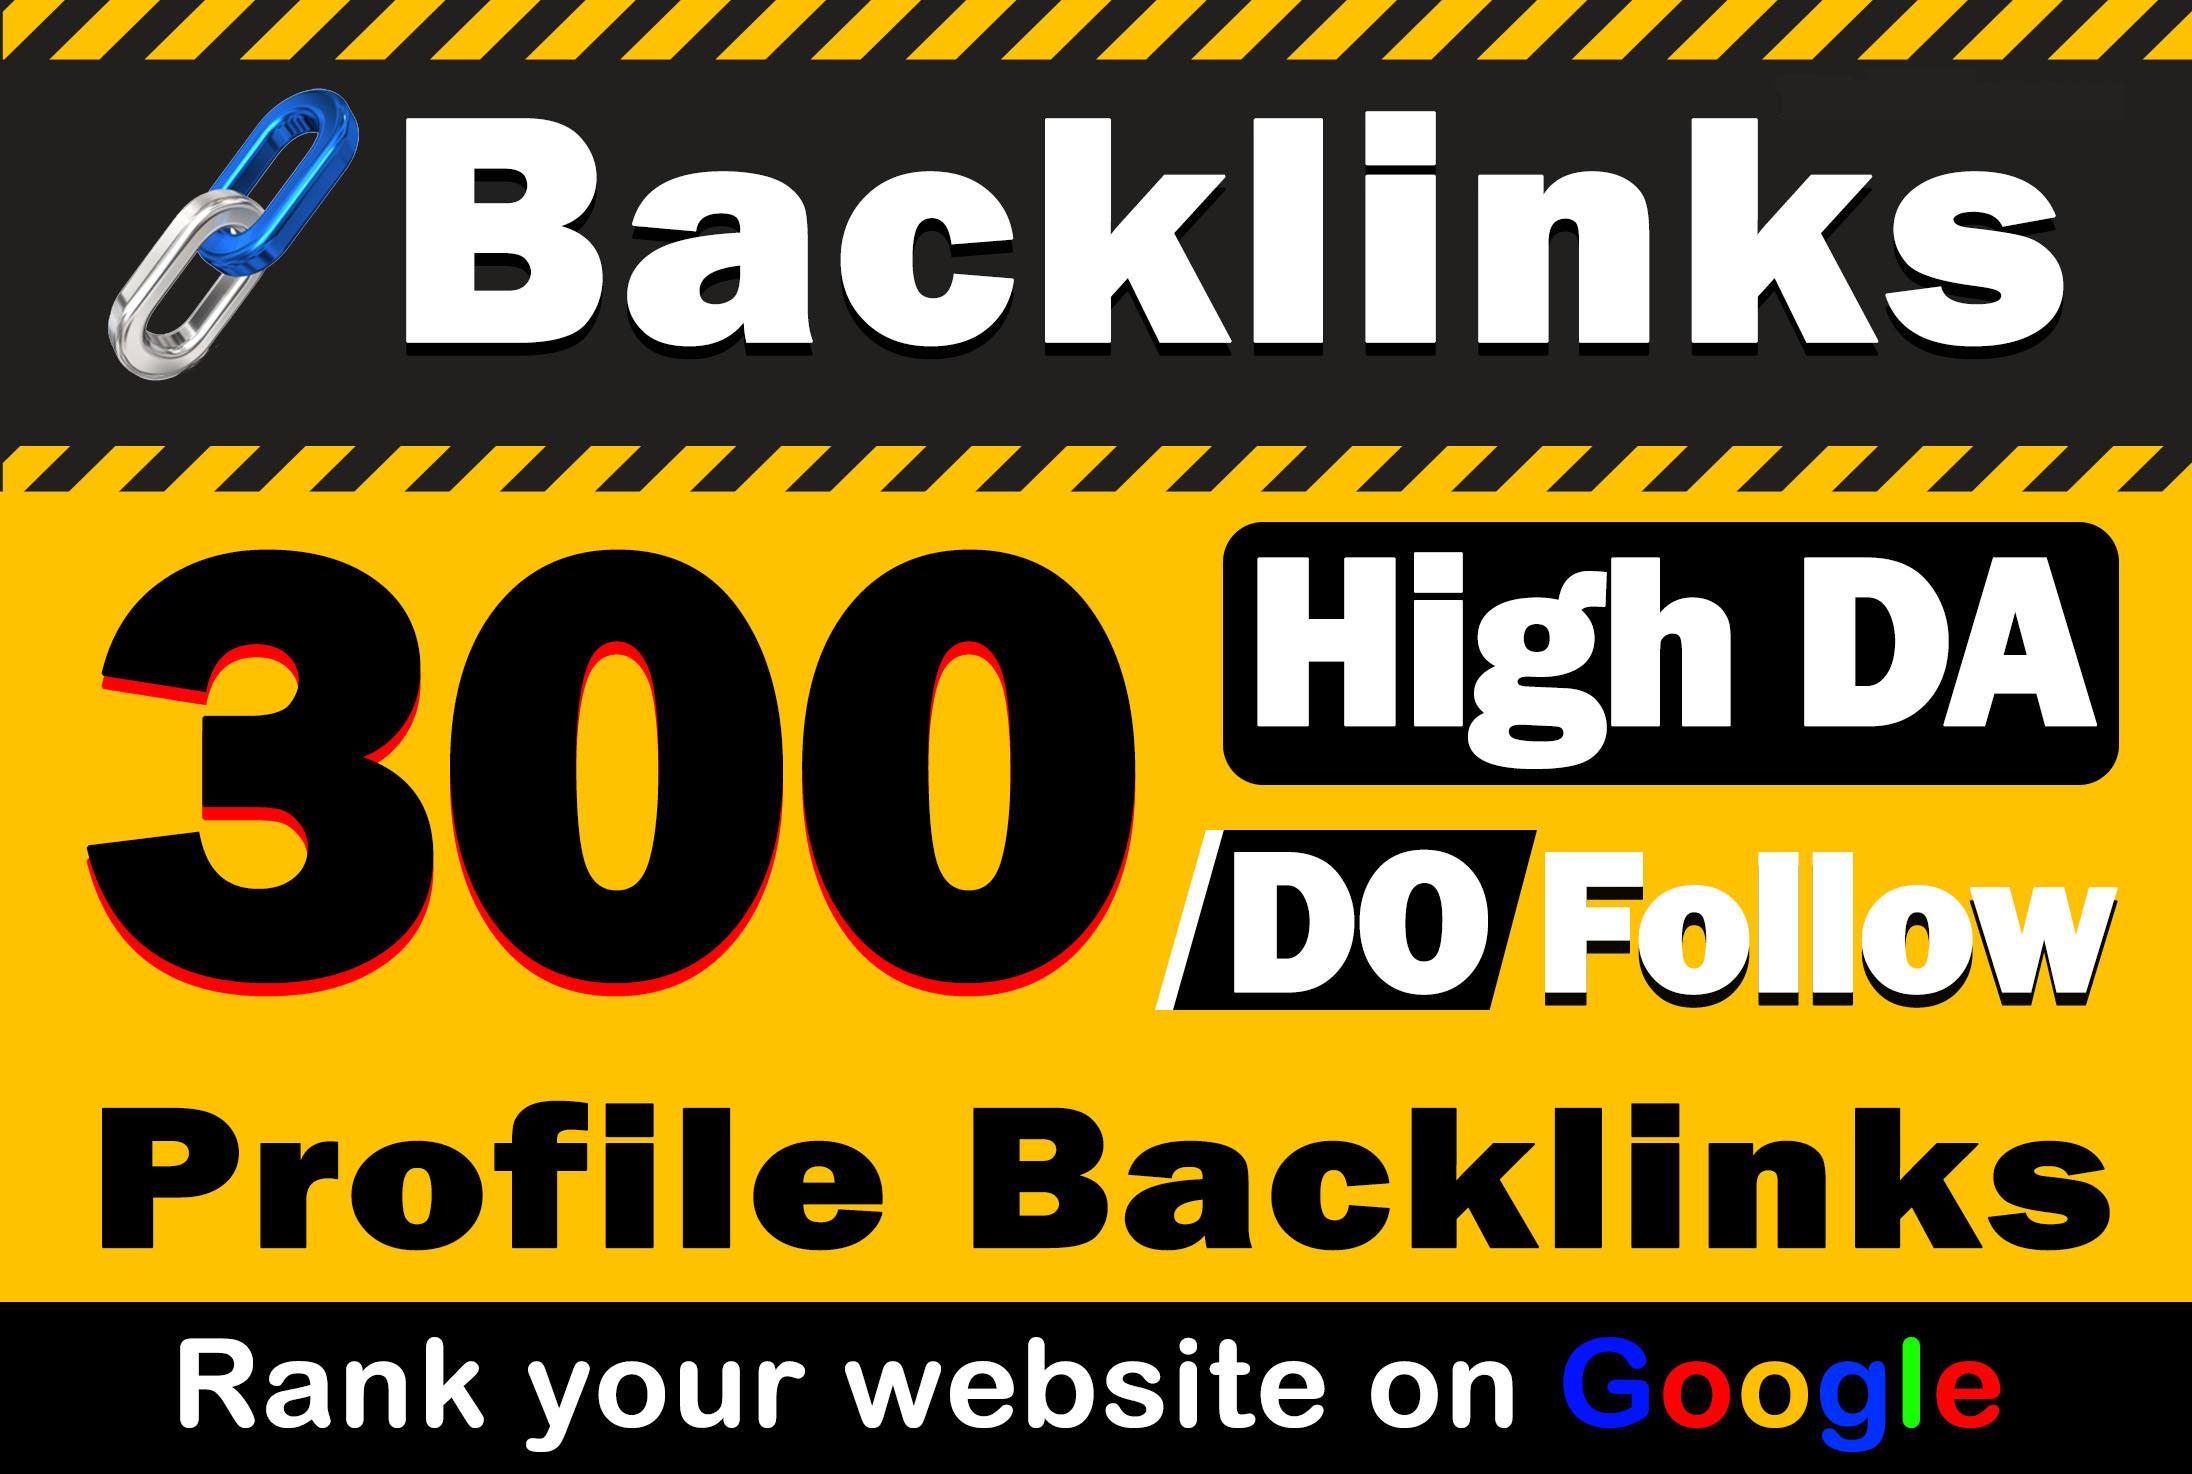 Build 300 Profile Backlinks High DA,  PA,  PR Permanent White Hat mithod